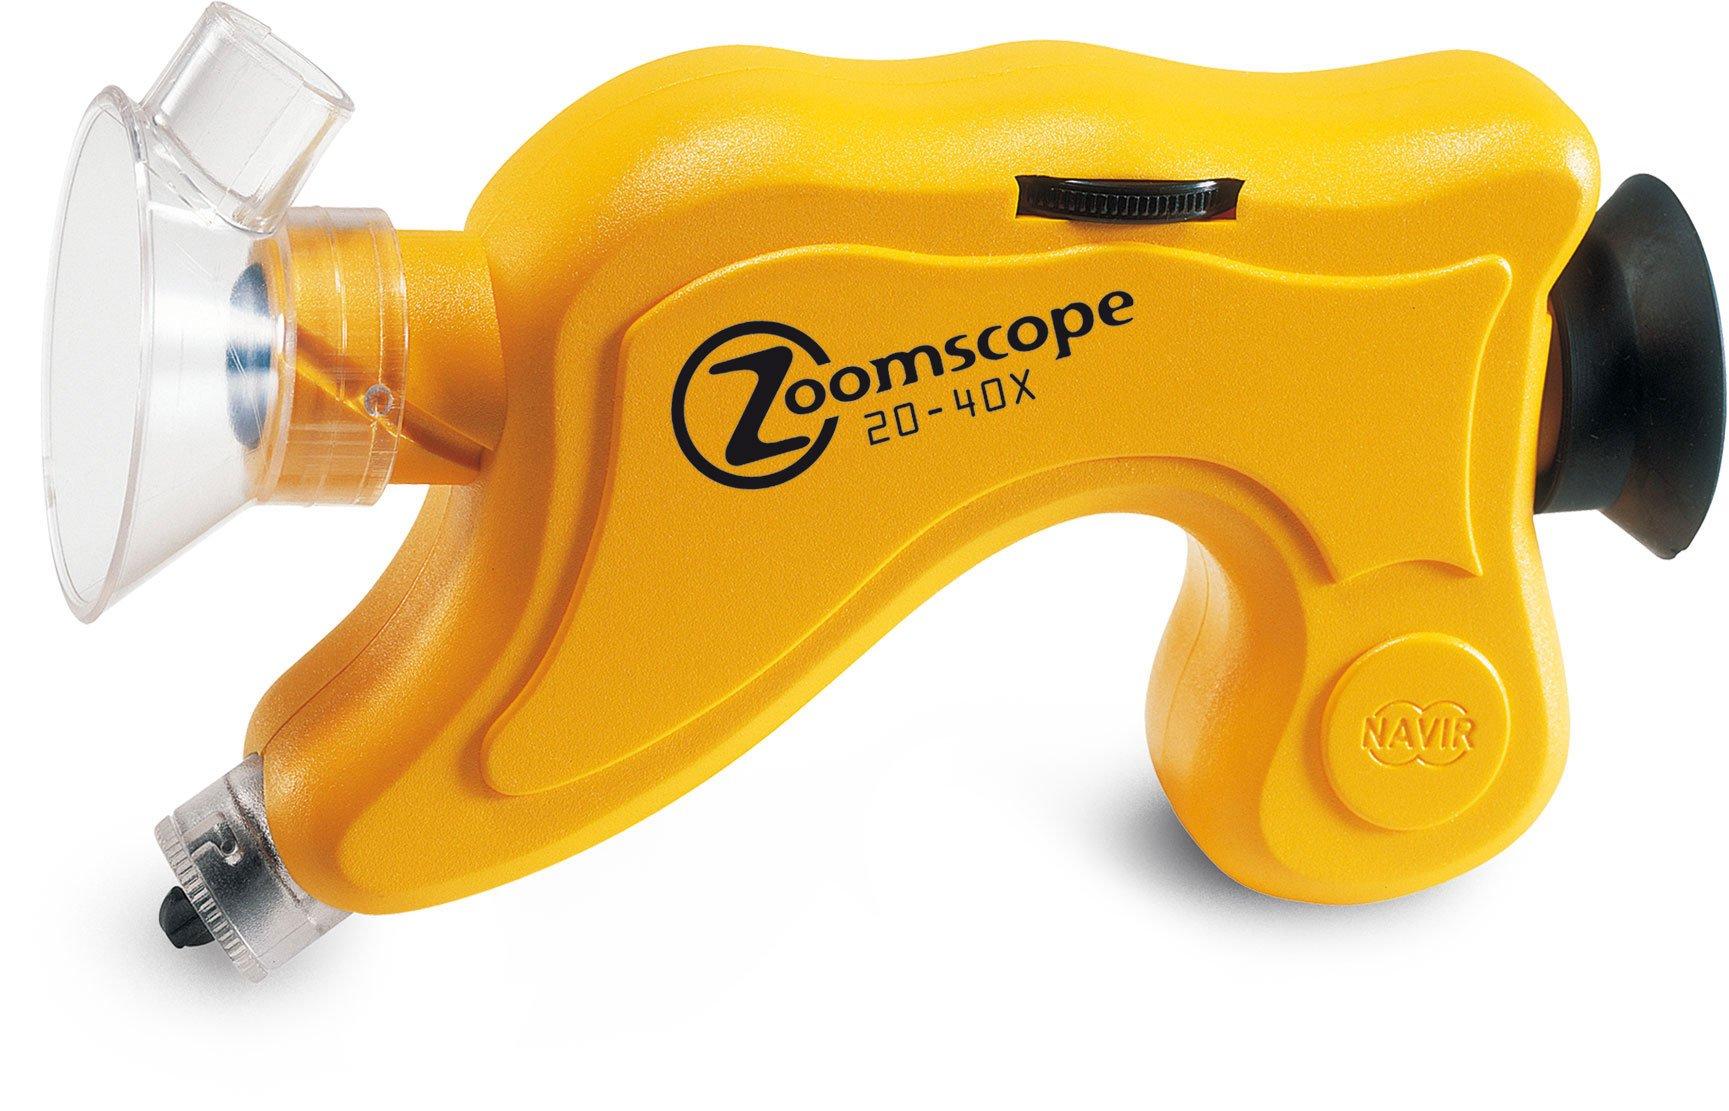 Zoomscope Microscope by Brookite